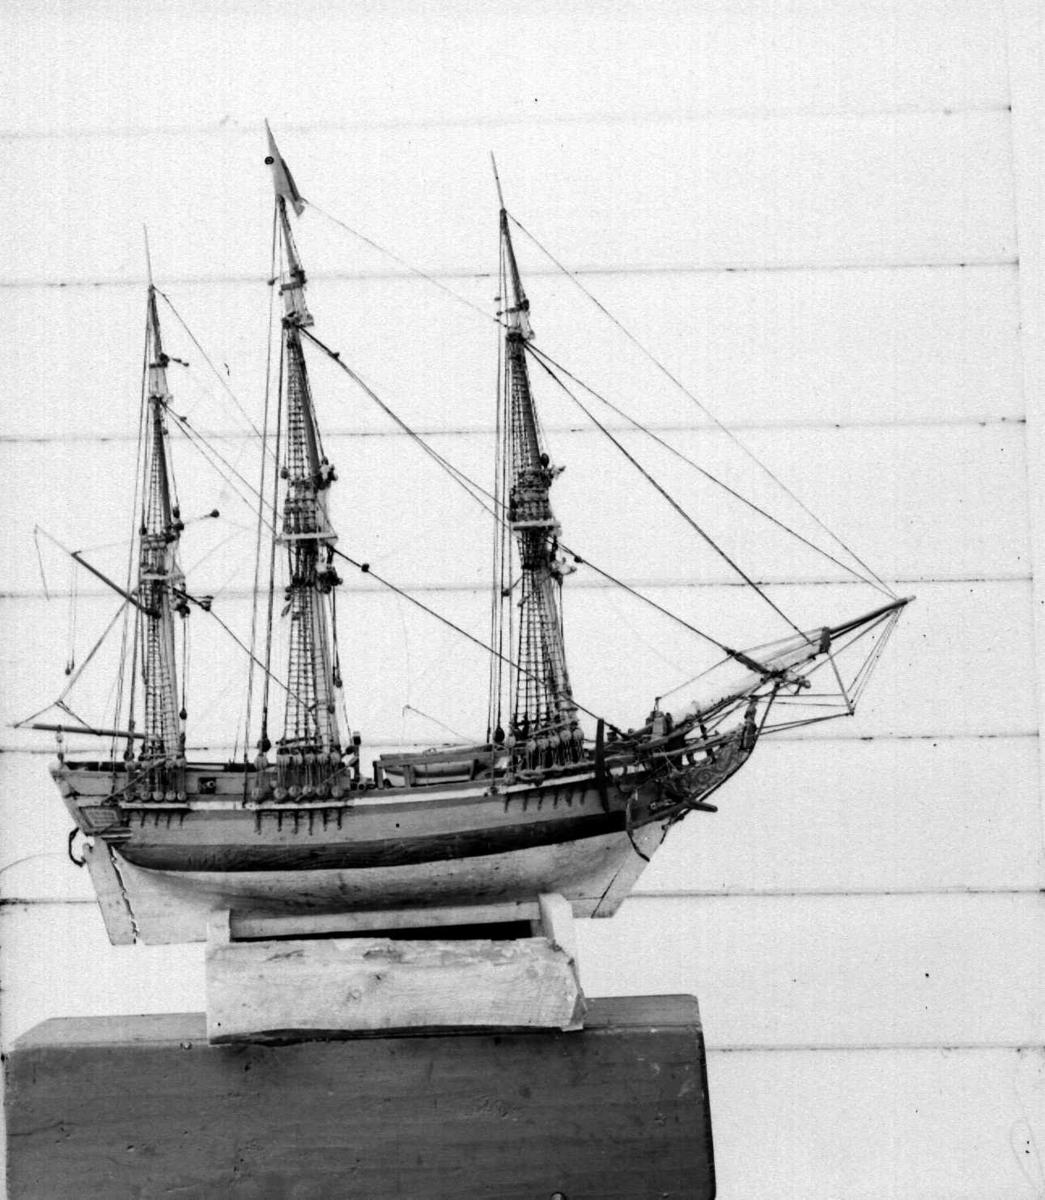 Utskåret tre-master, seilskip, bark - kirkeskipet i Fåberg kirke.